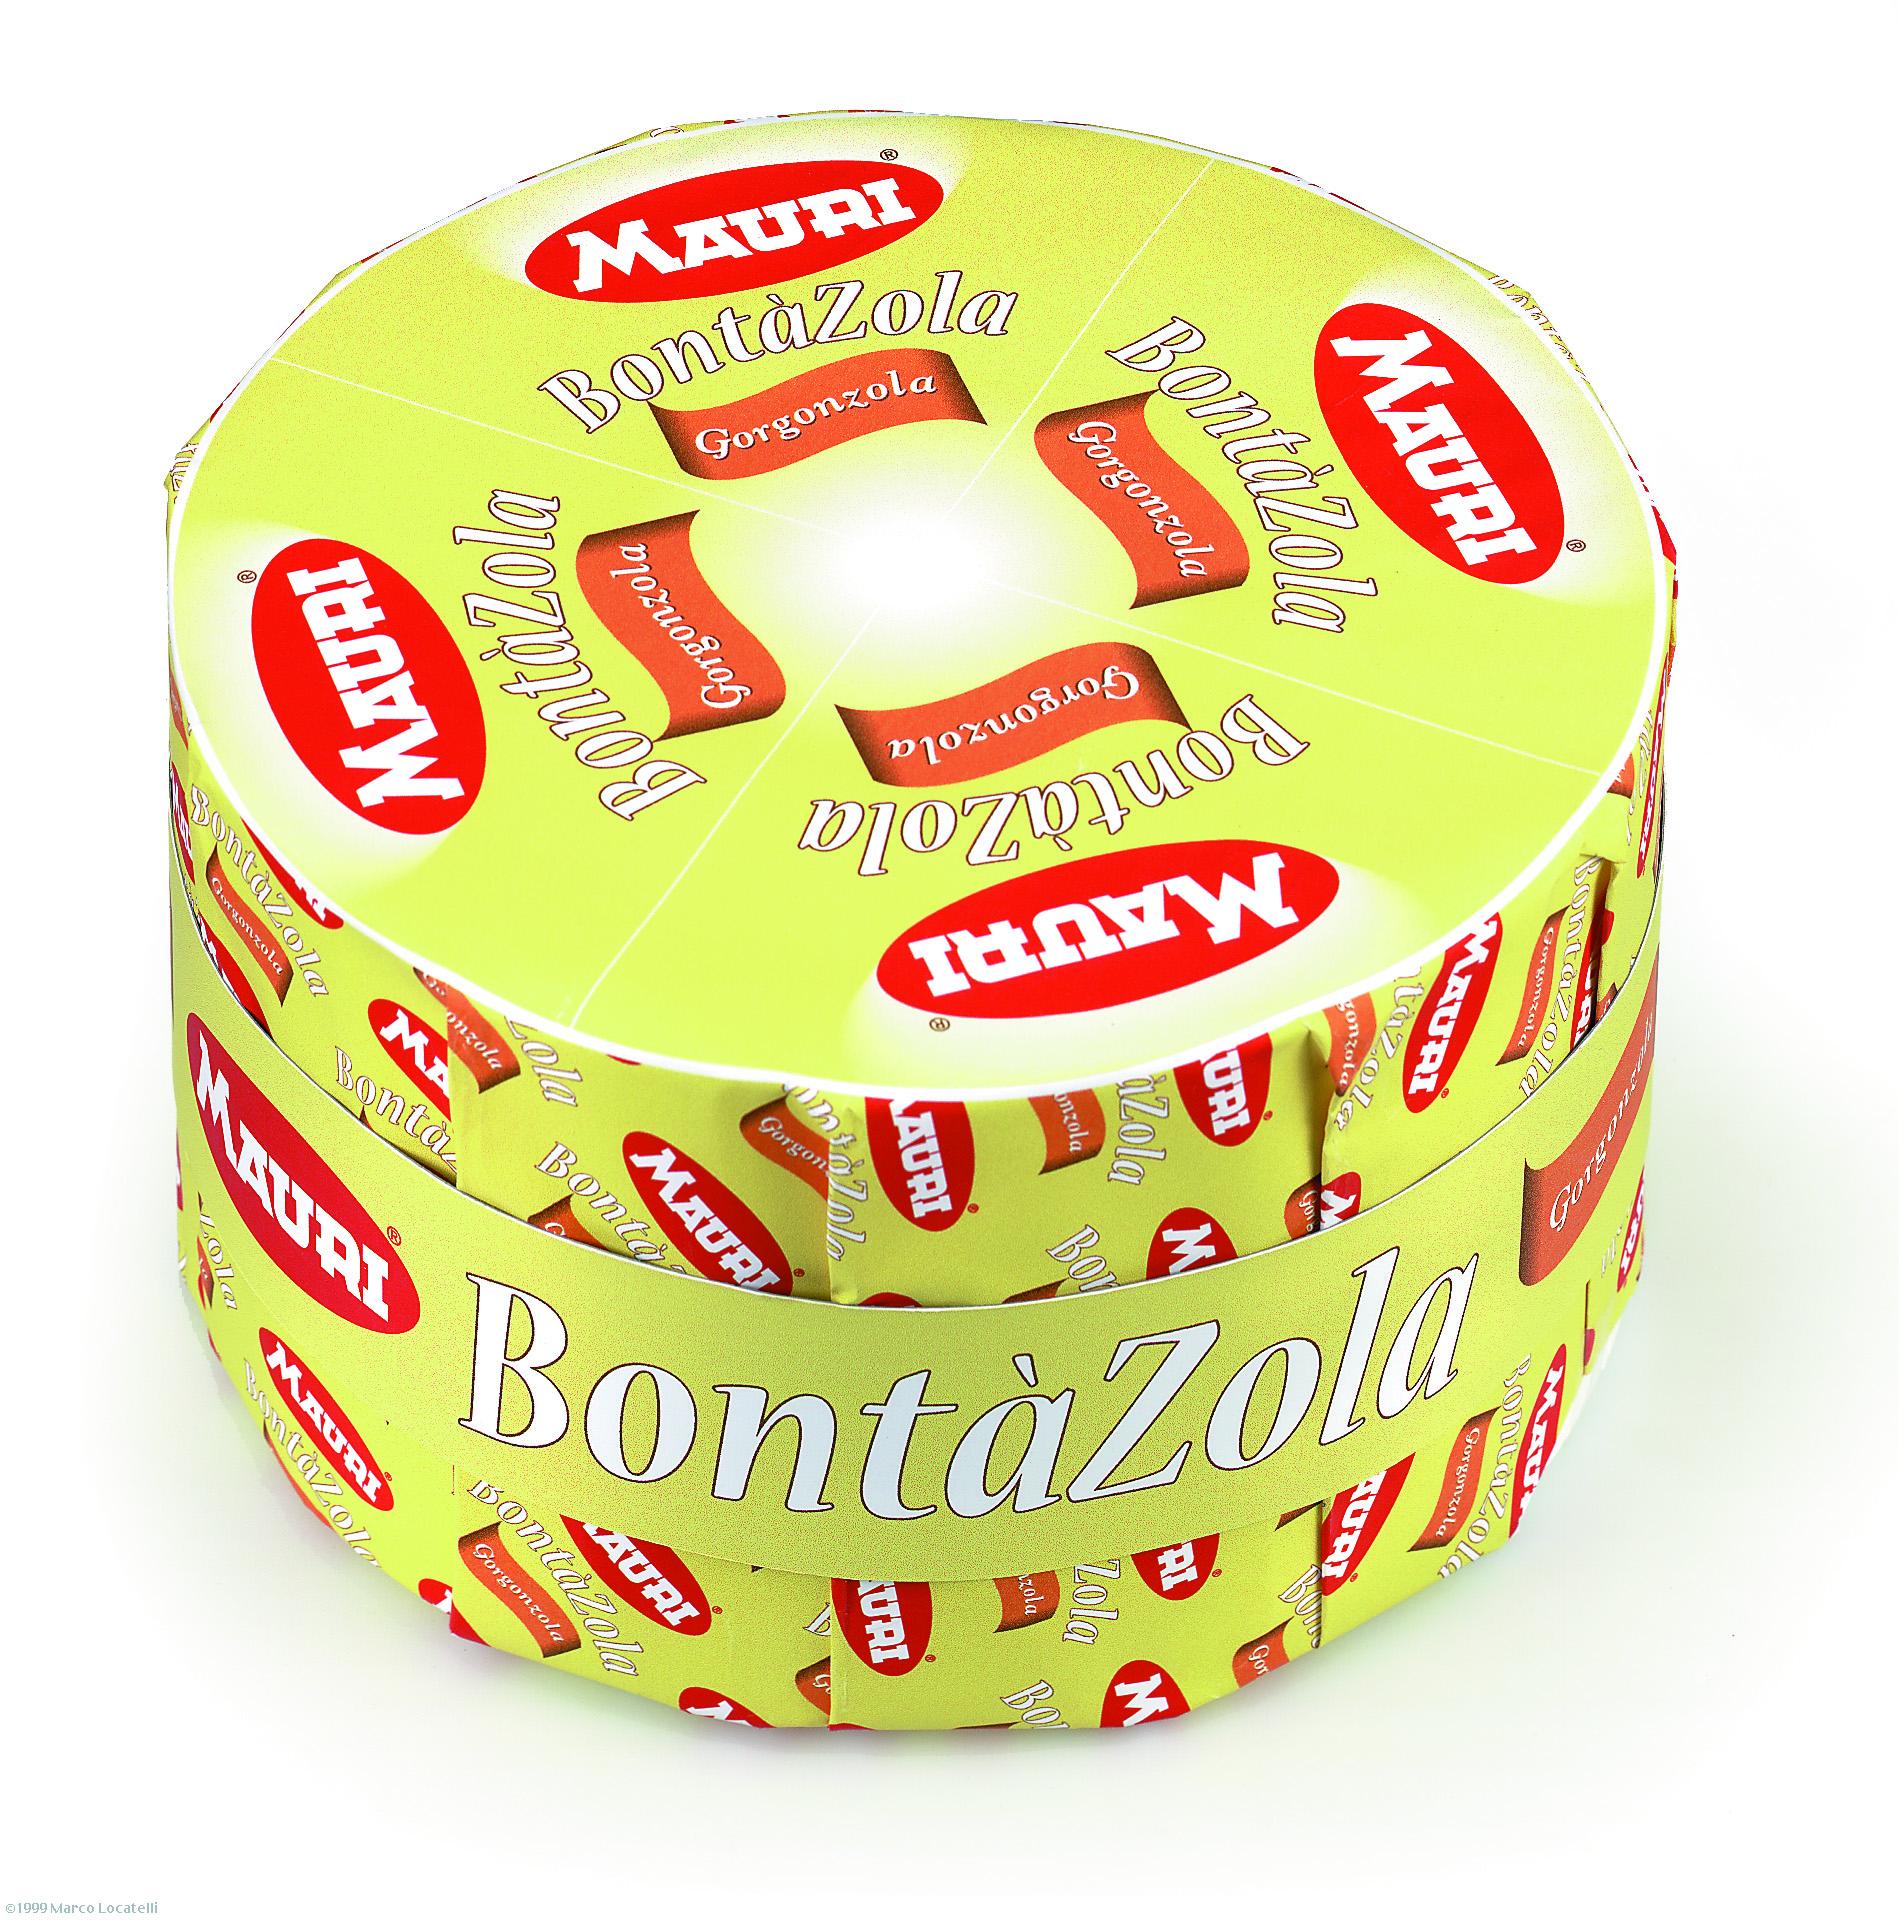 Bontazola